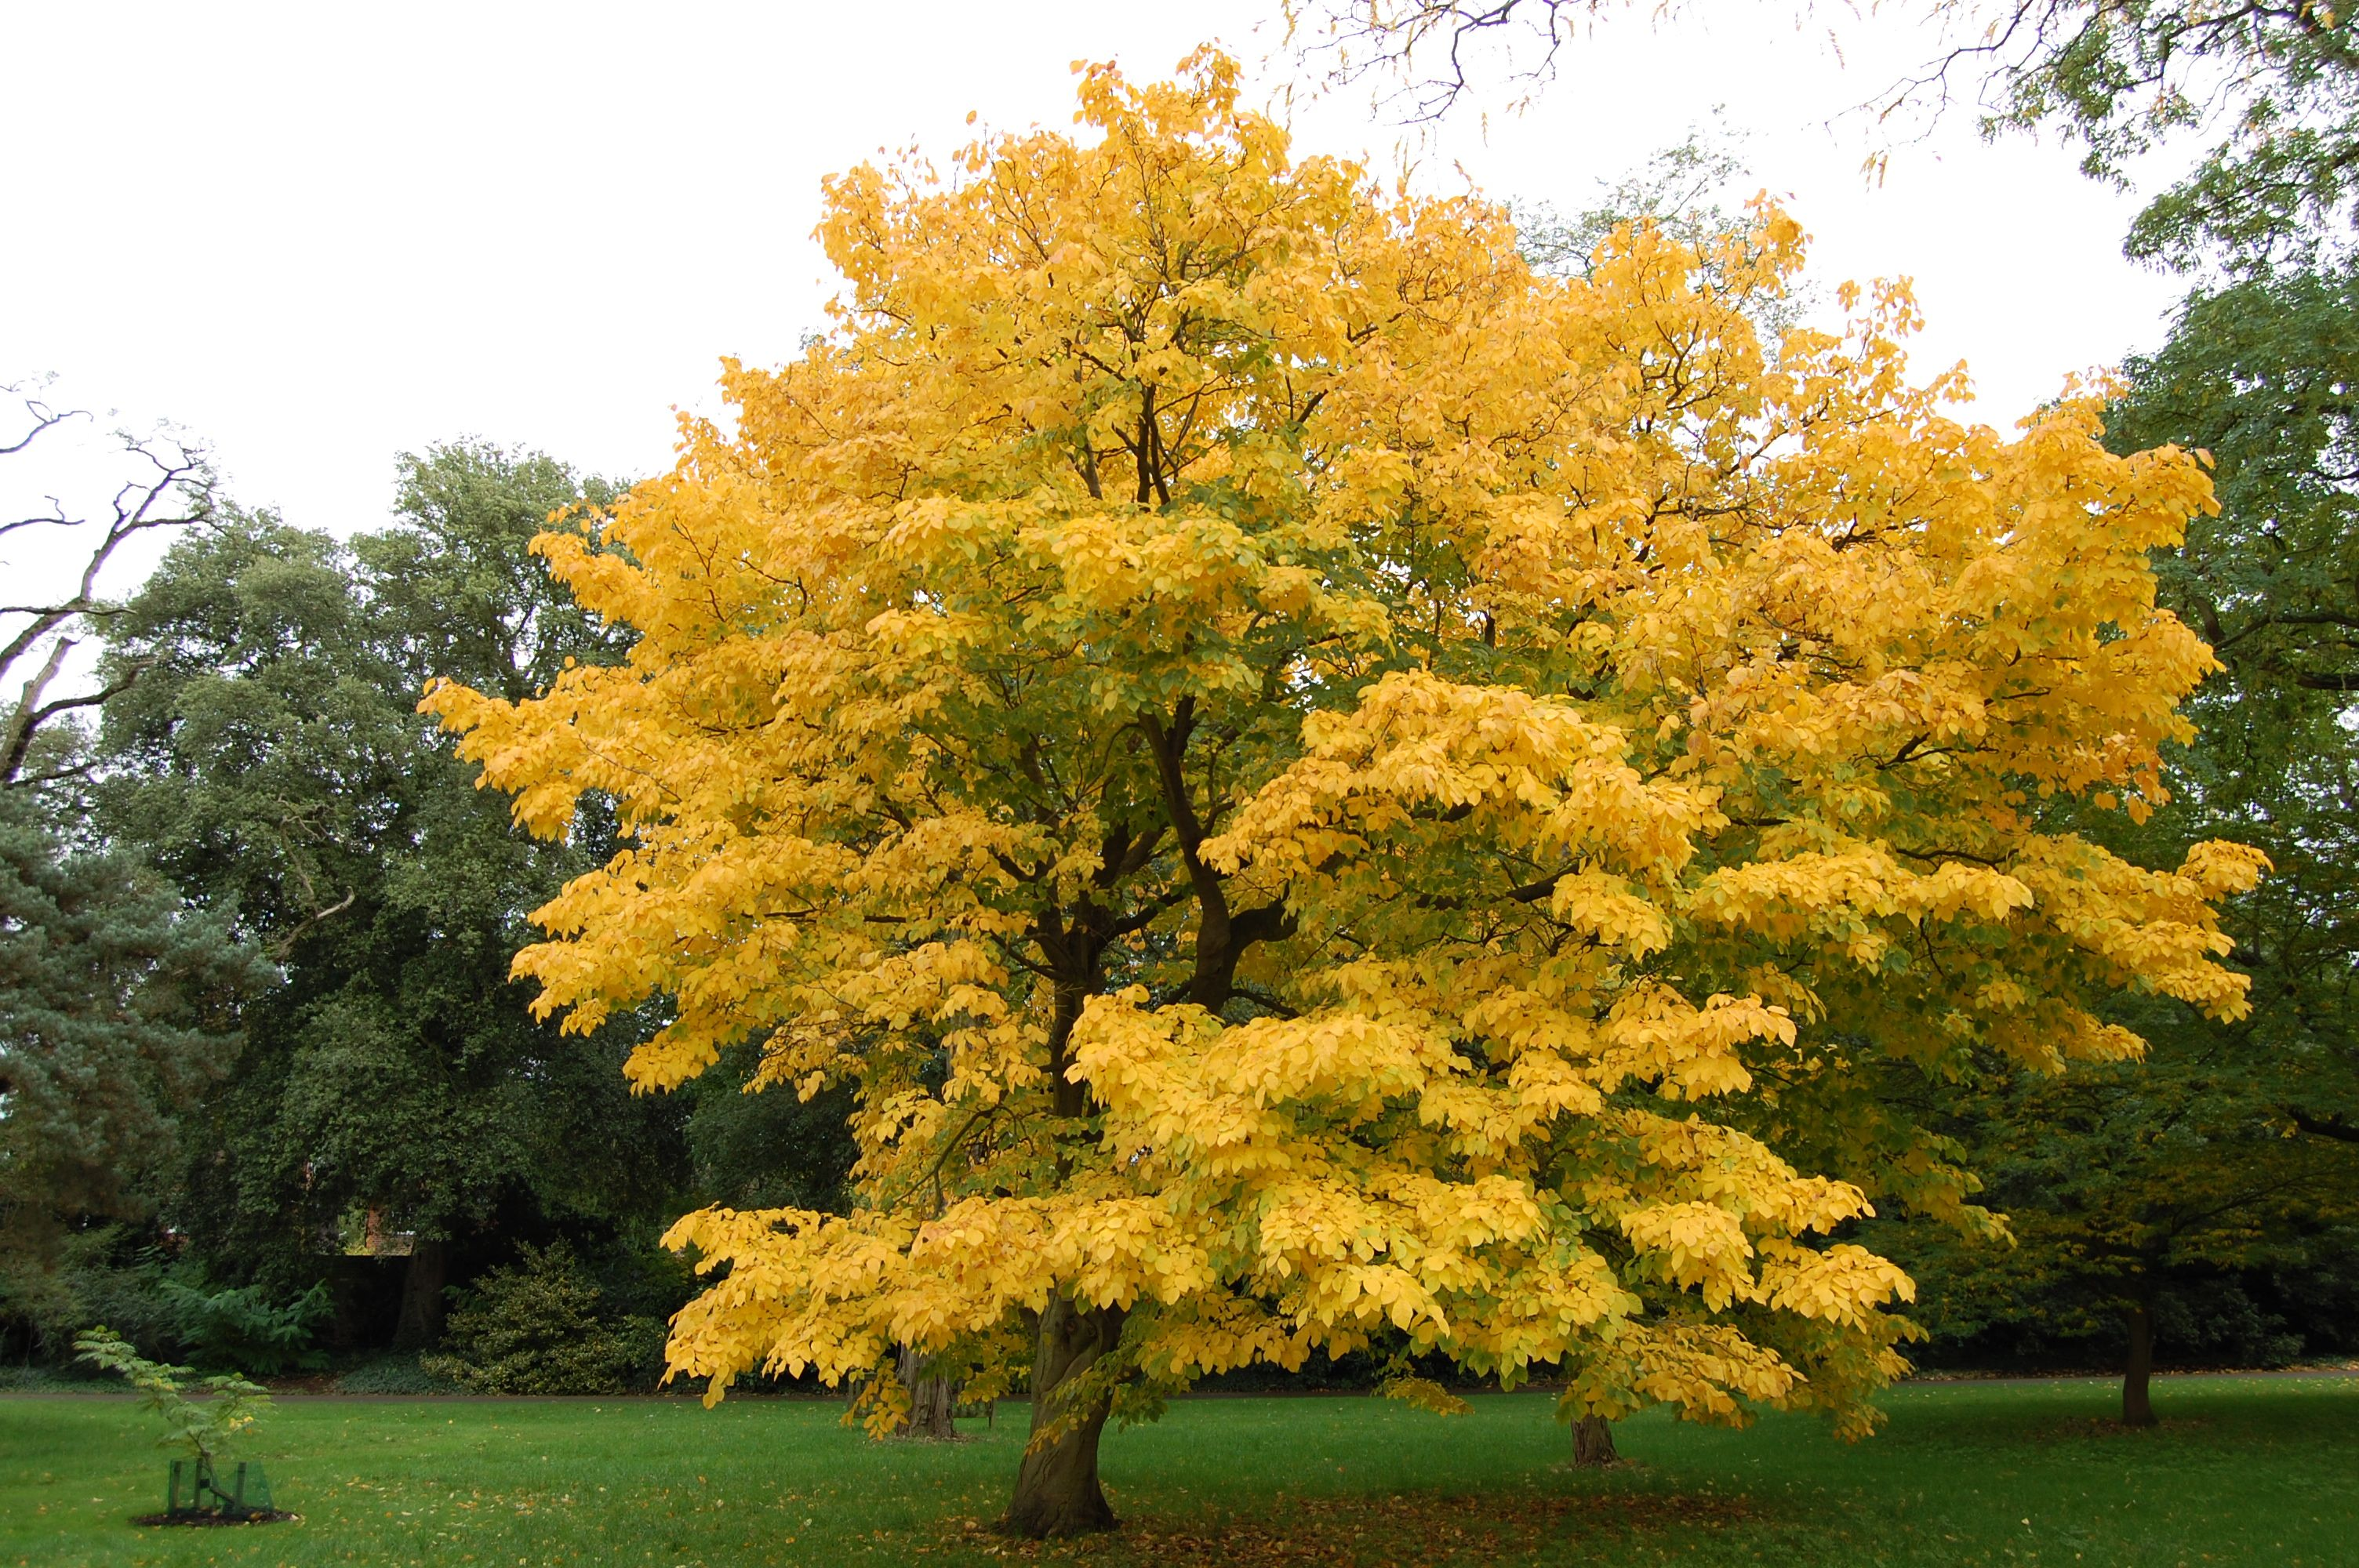 Cladrastis kentukea kew gardens gardens and deciduous trees for Garden deciduous trees